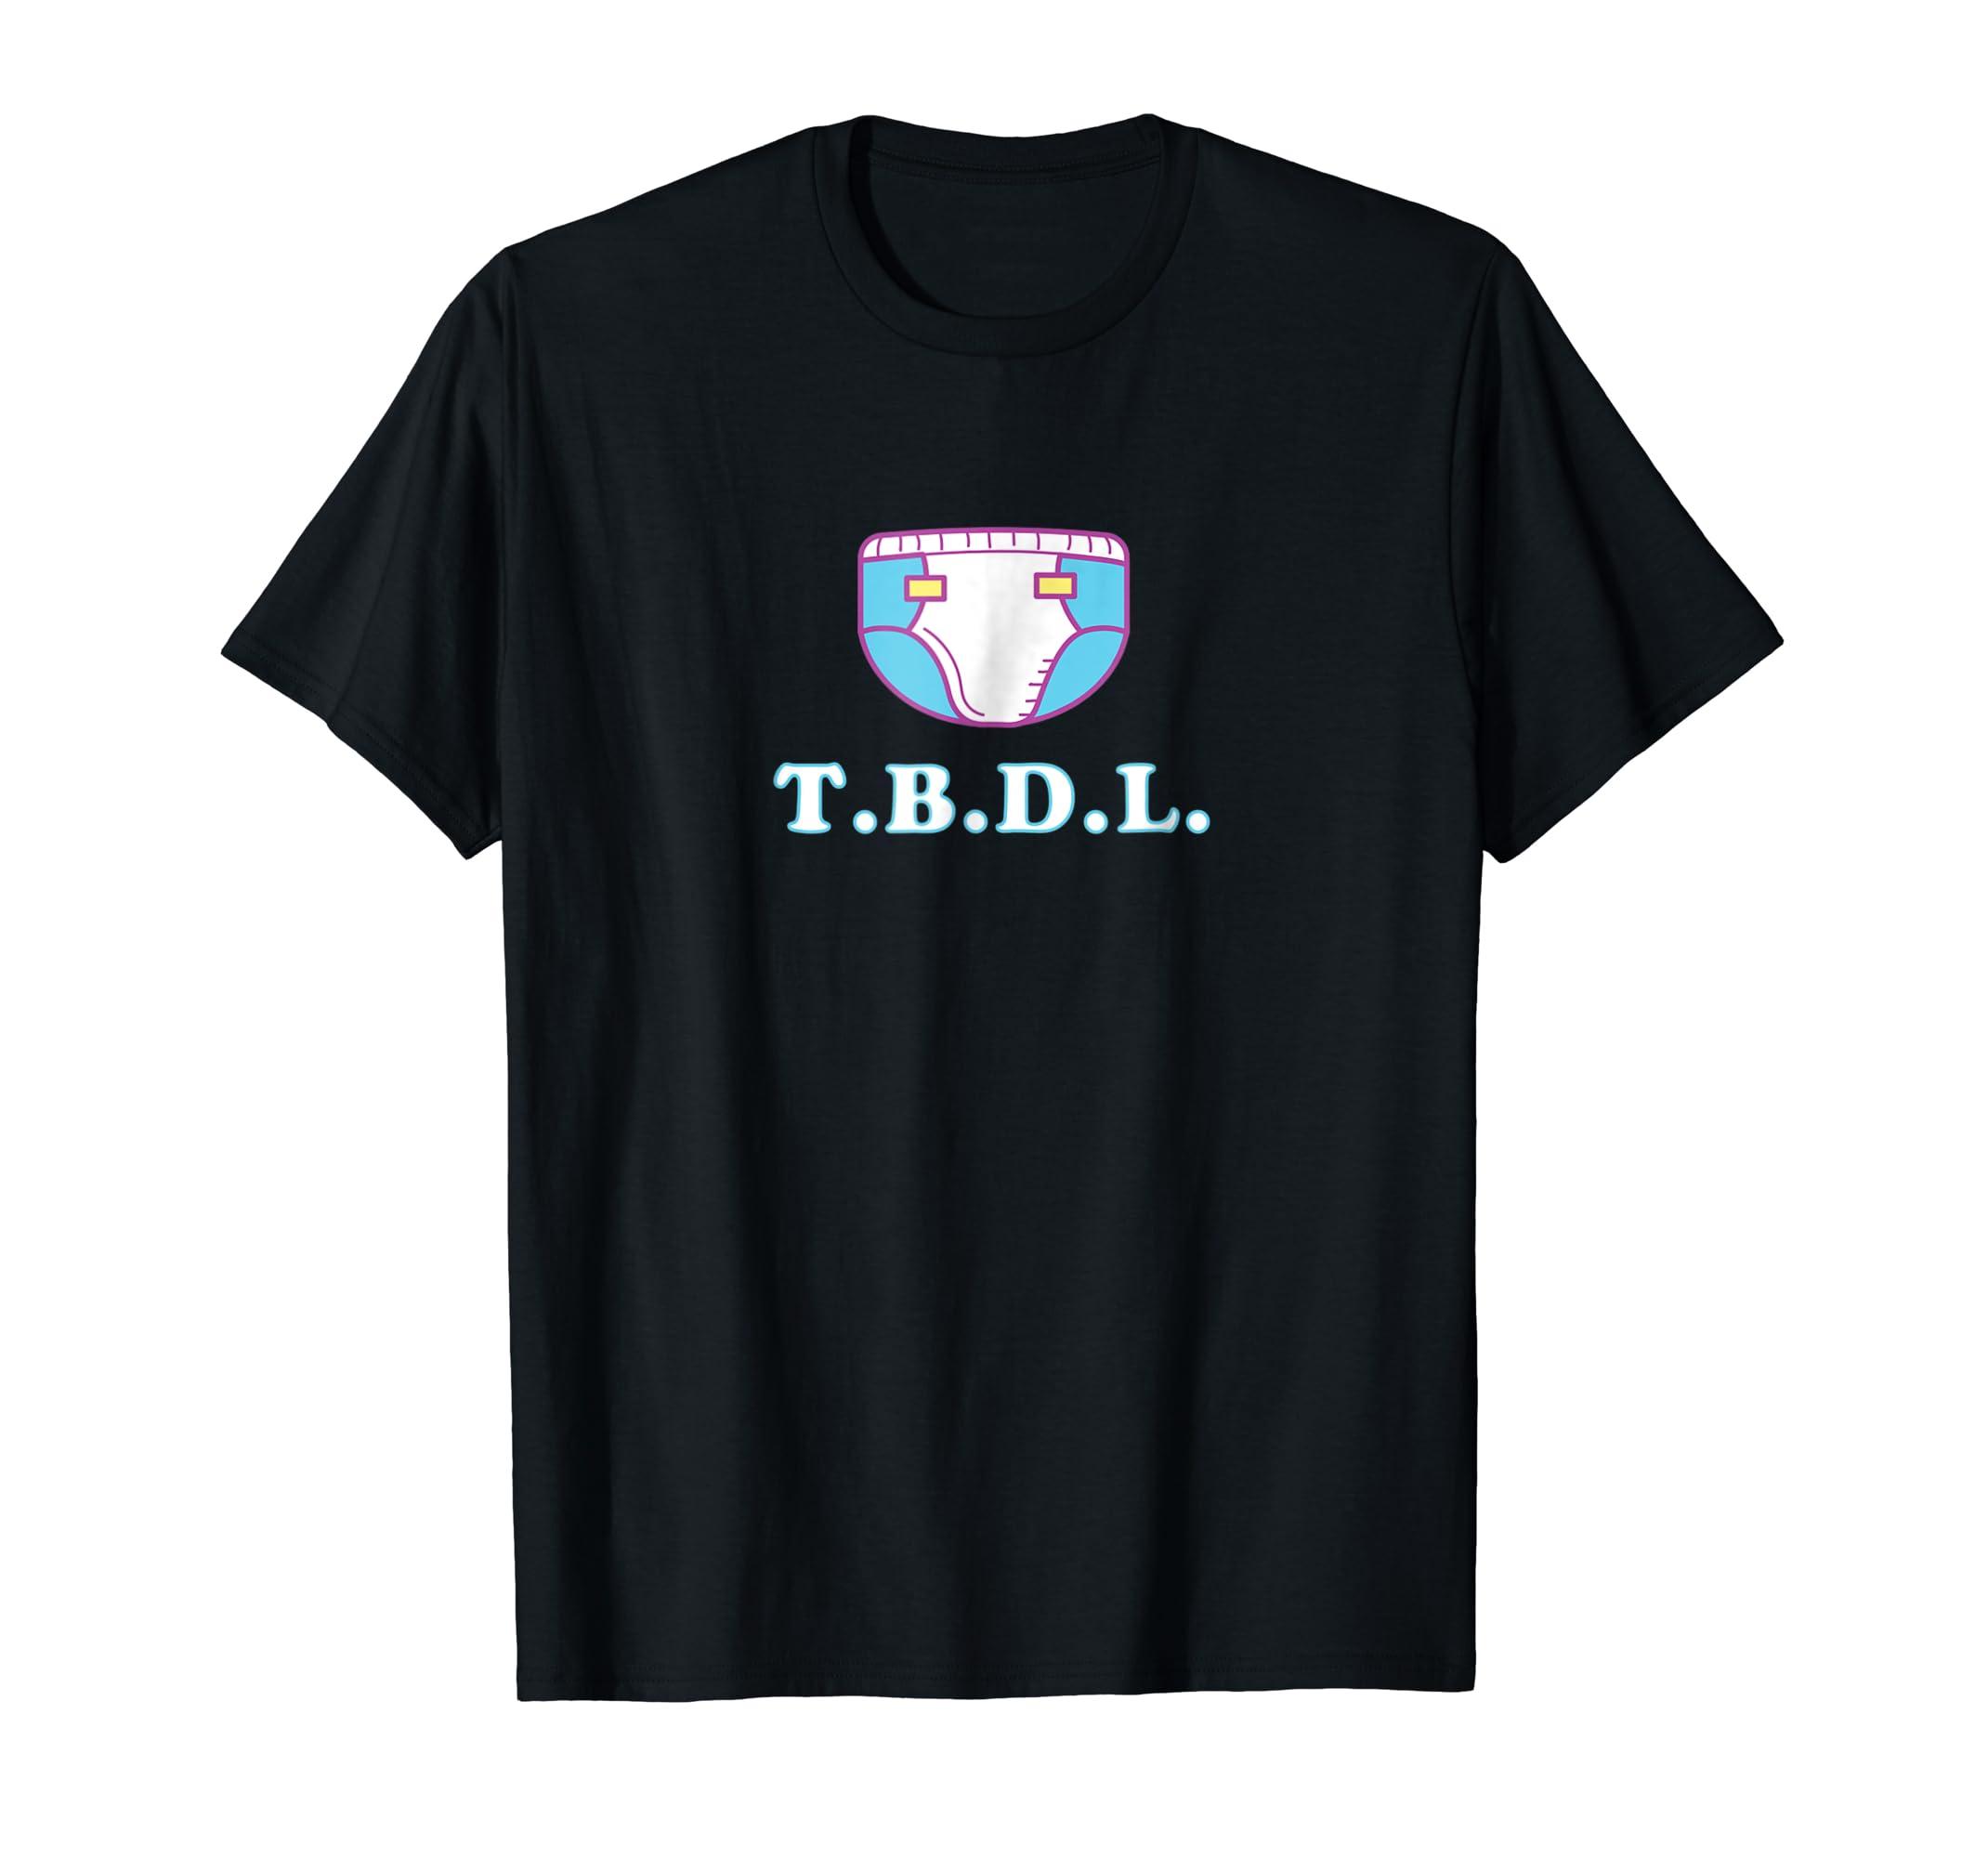 tbdl life